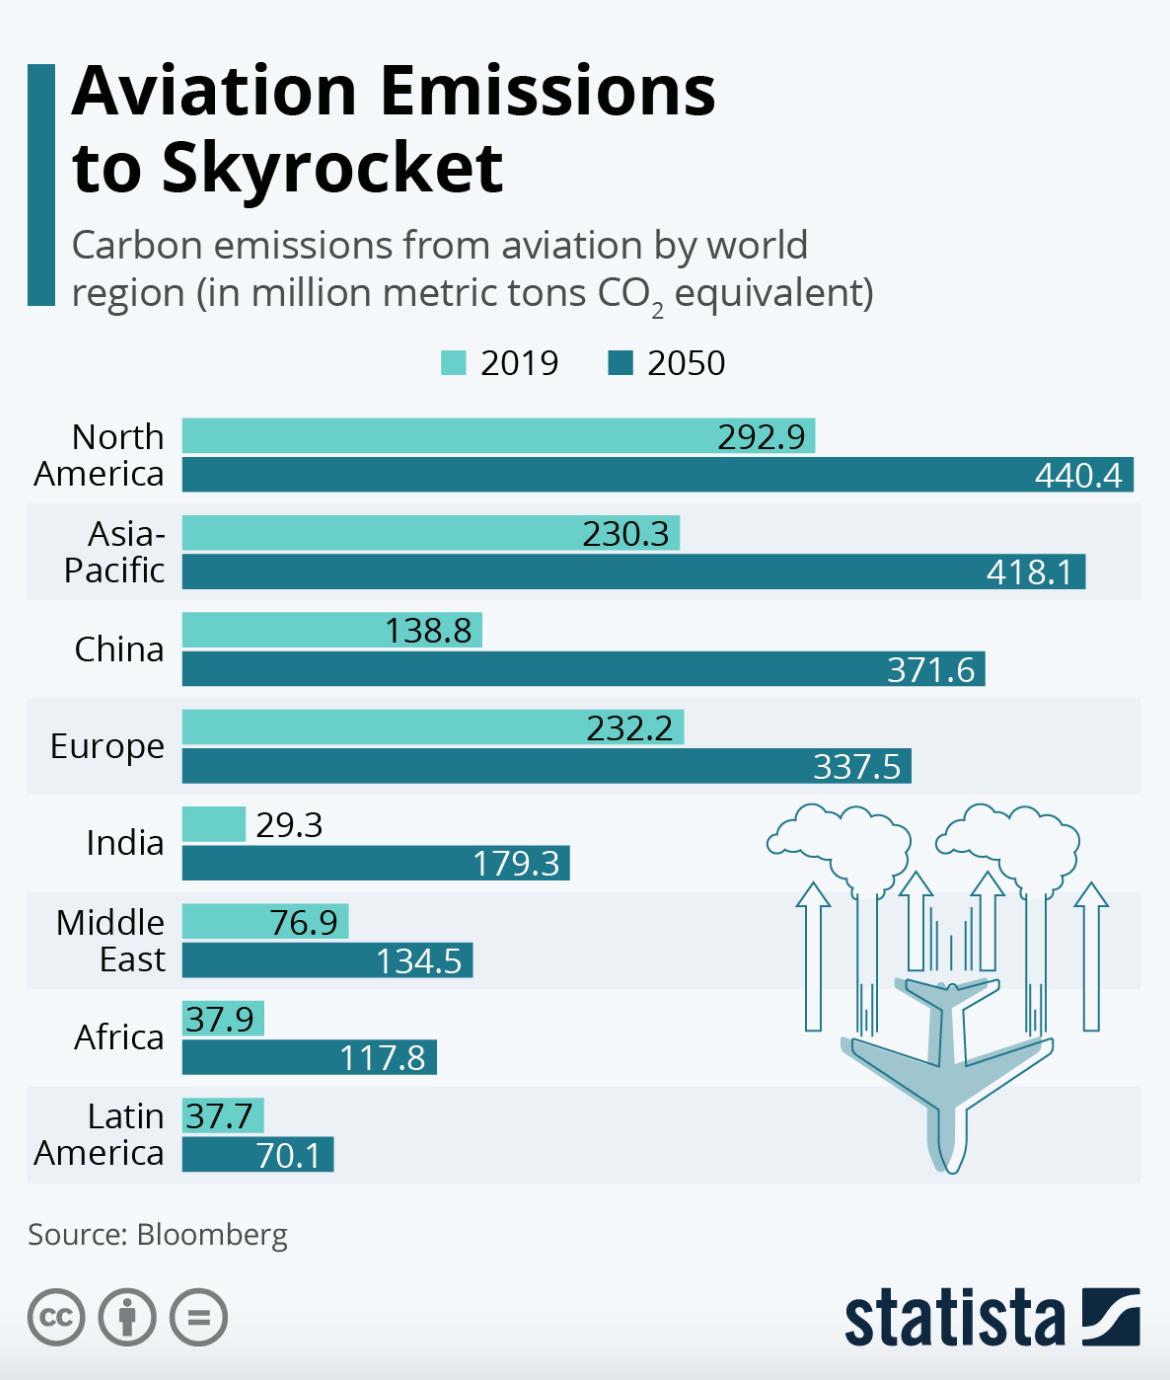 Aviation emissions to skyrocket